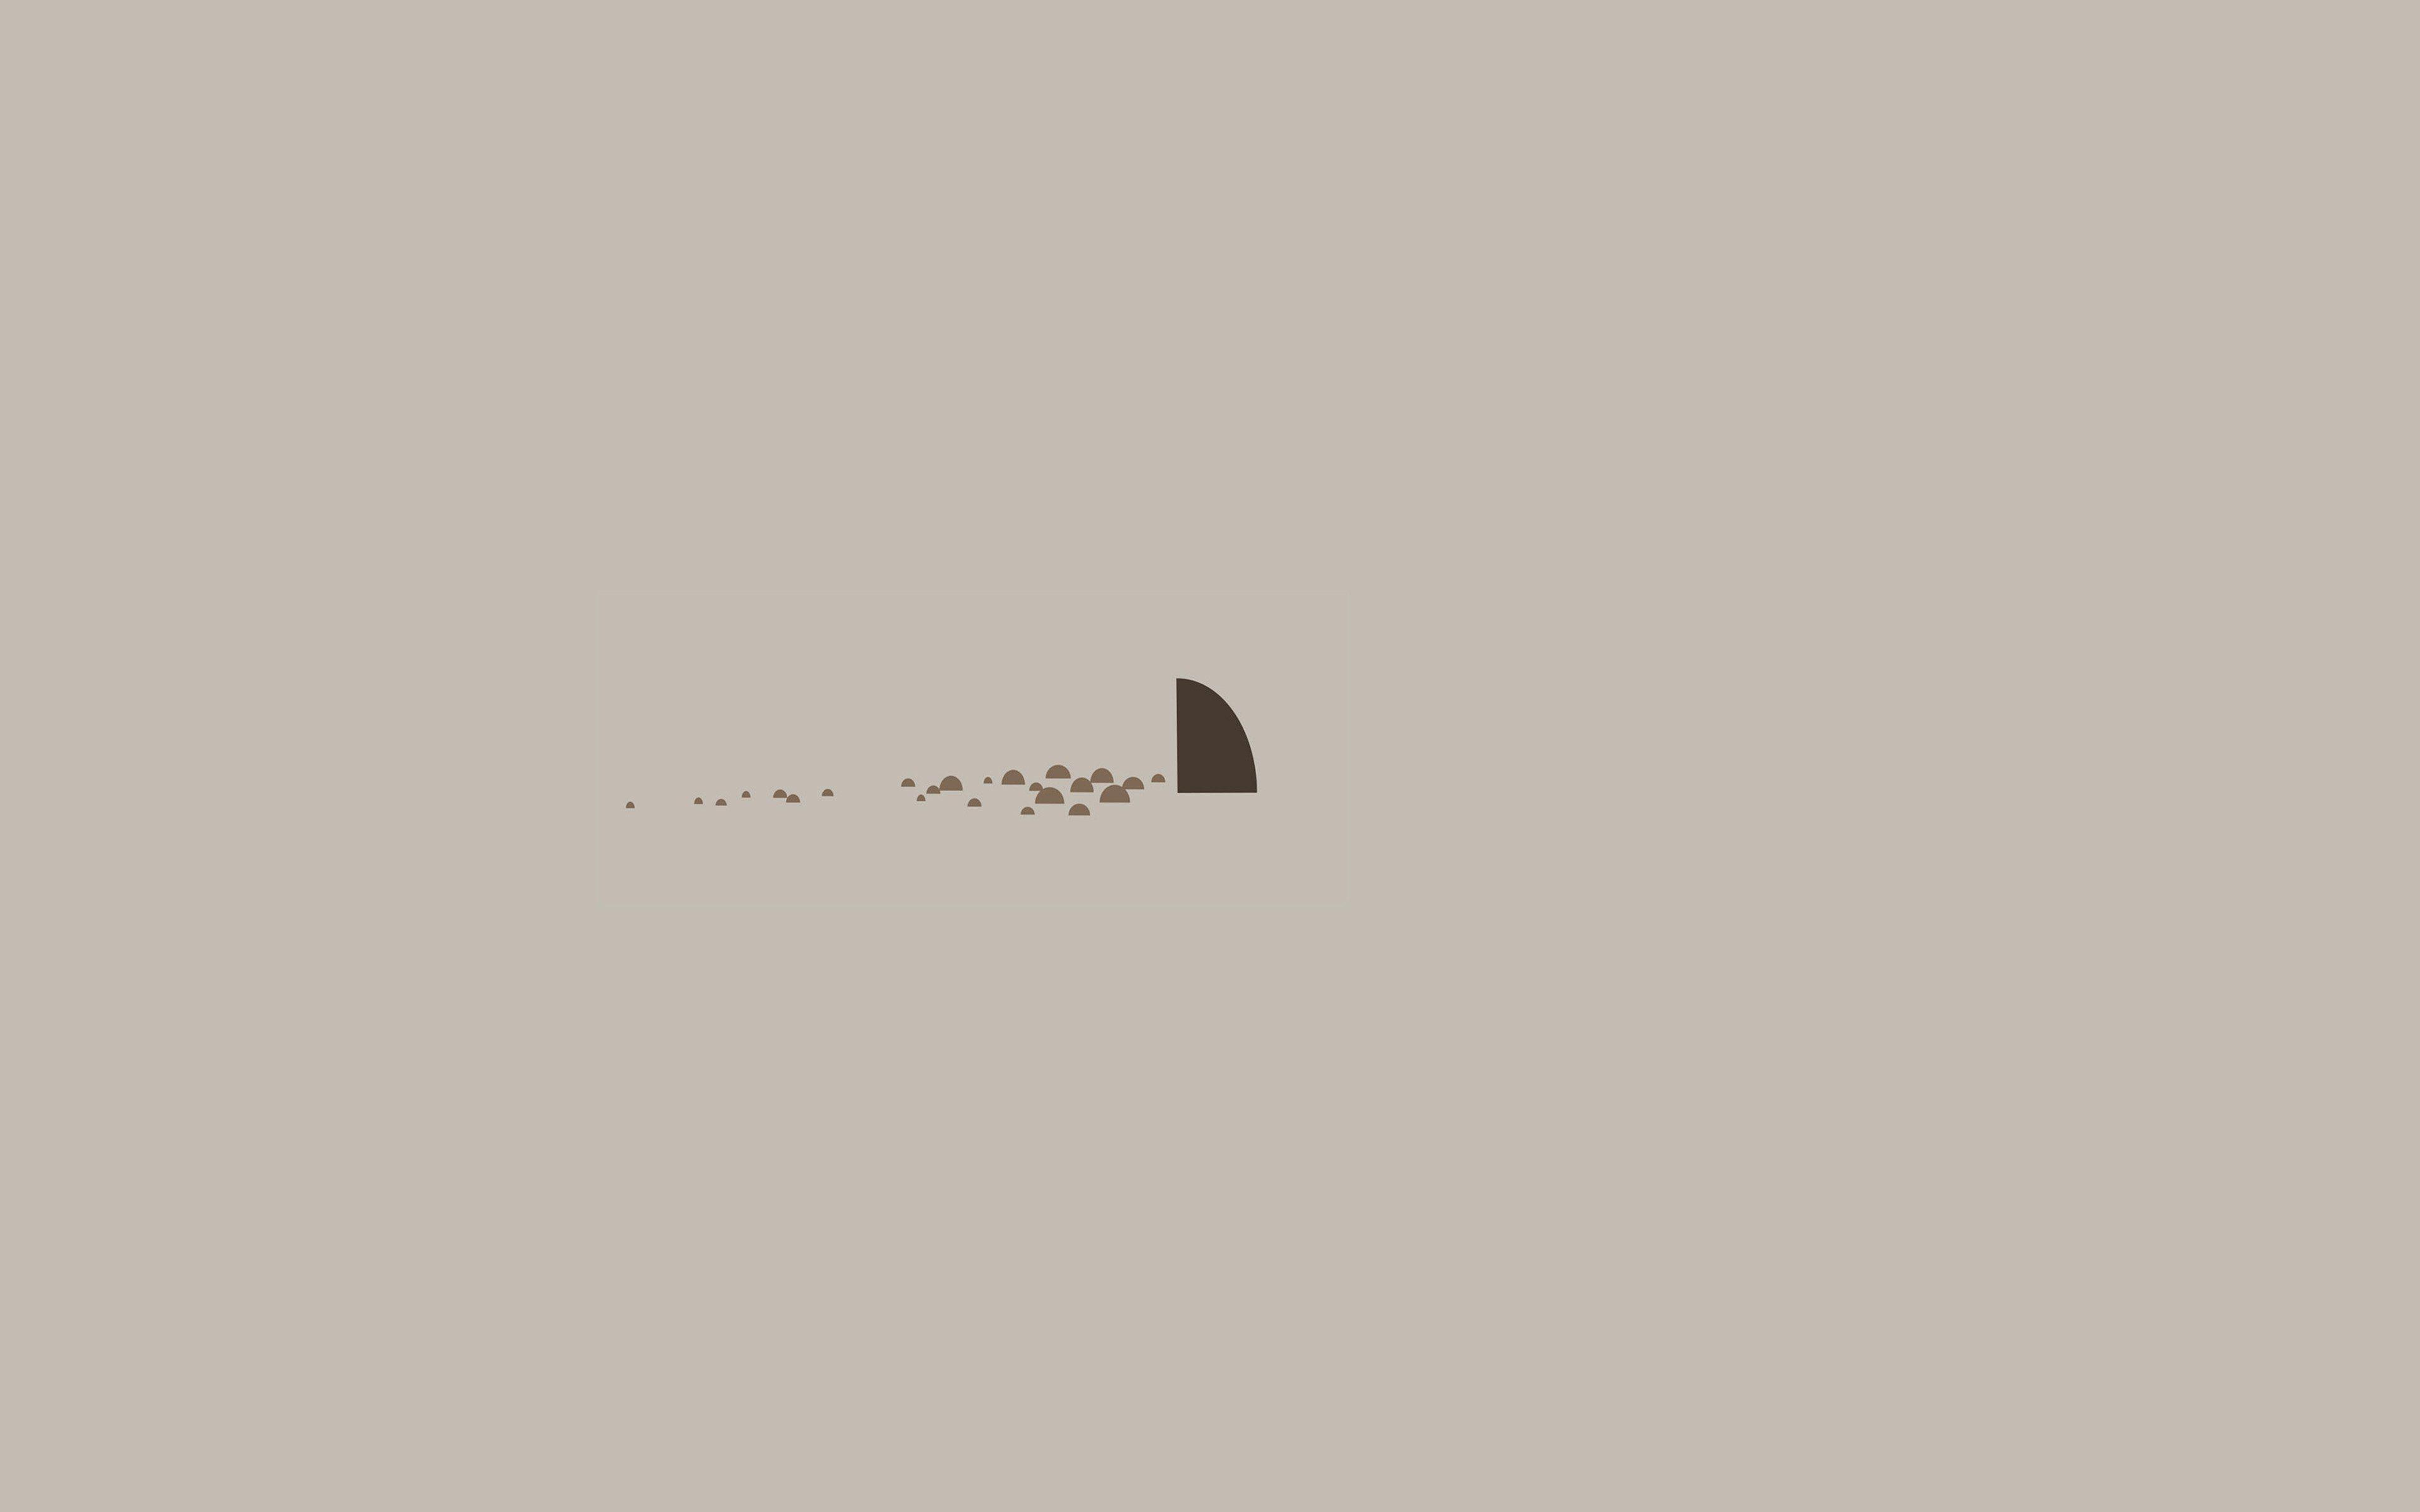 aesthetic simple desktop backgrounds